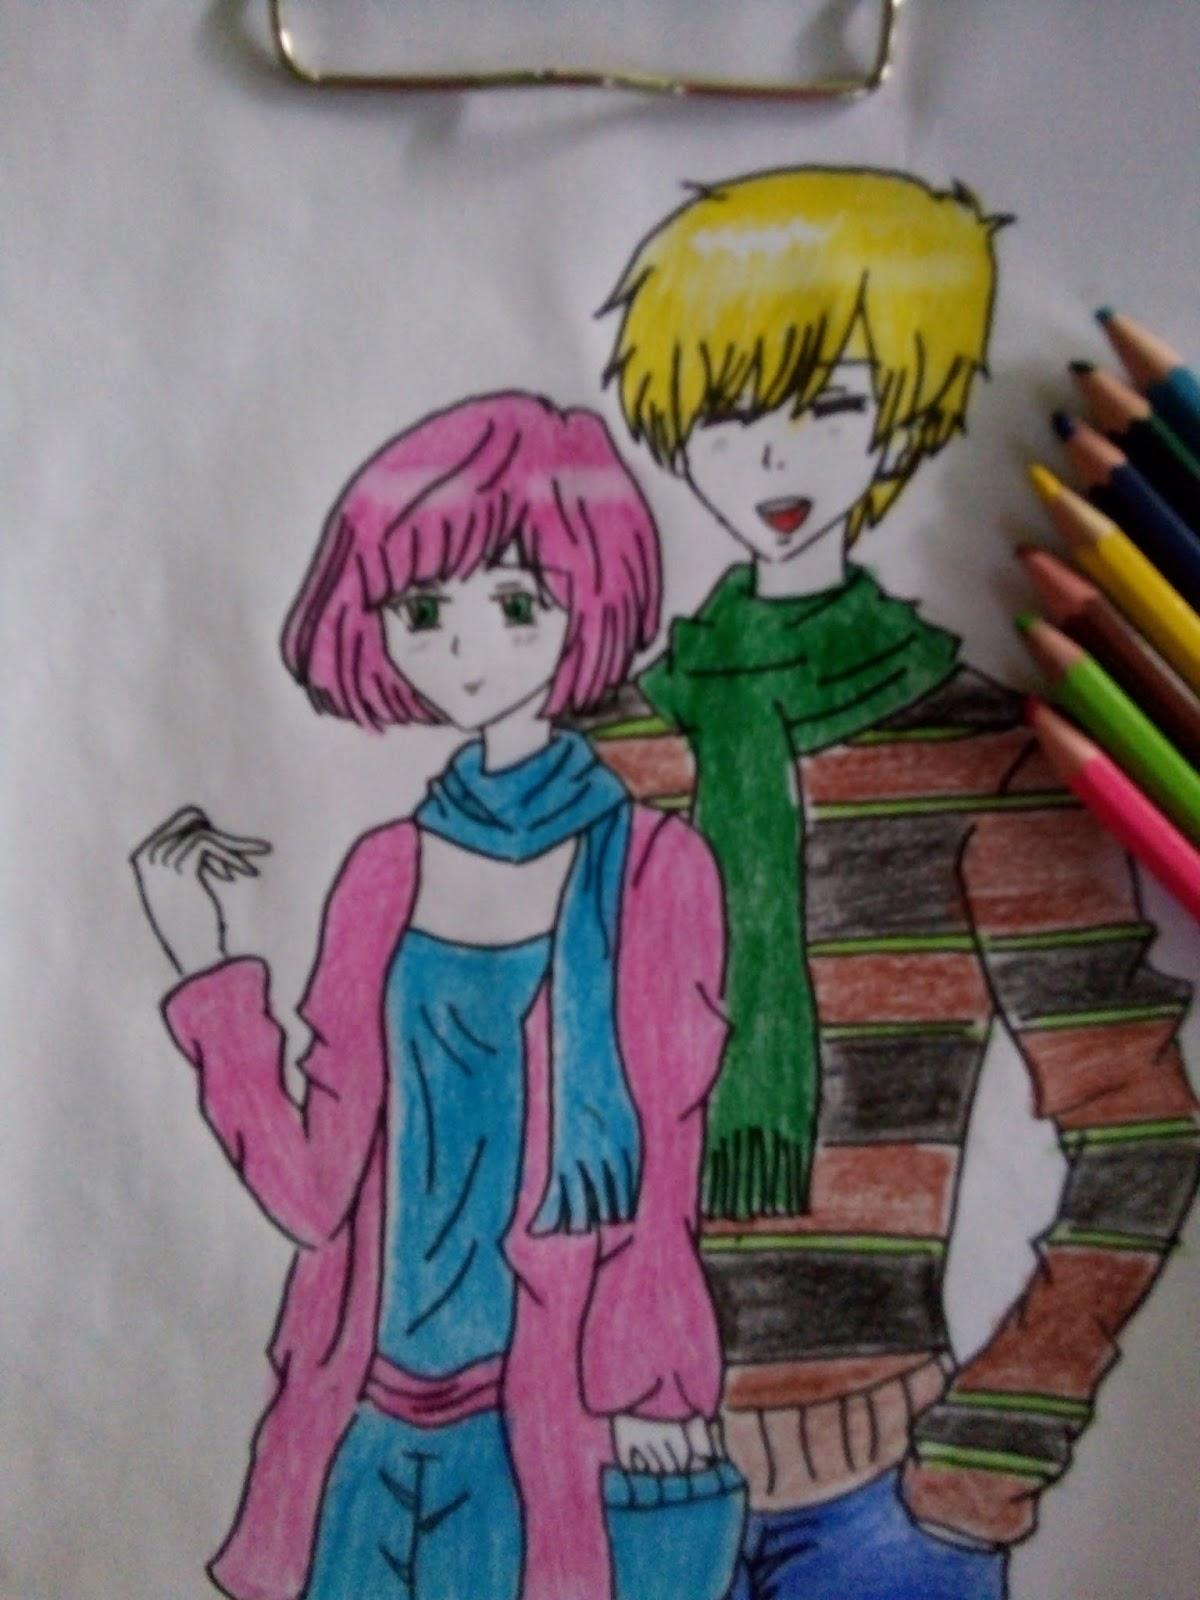 Gambaran harian dewi manga tutorial menggambar manga couple dengan pose simpel